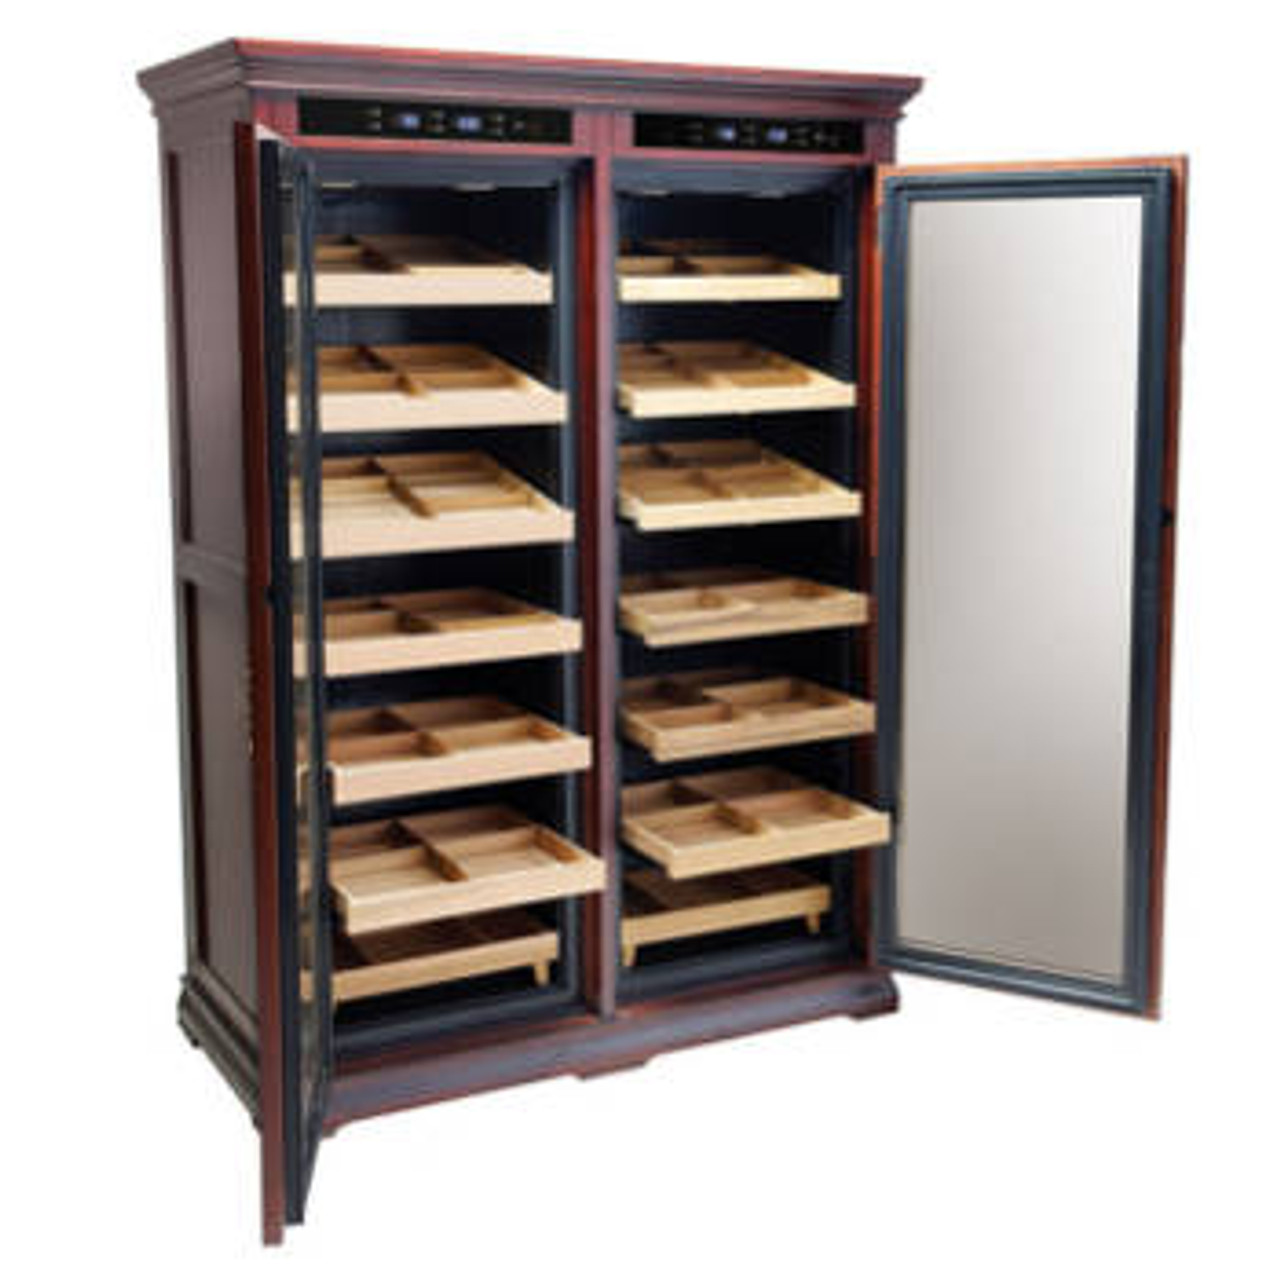 The Reagan Electronic Cigar Humidor Cabinet